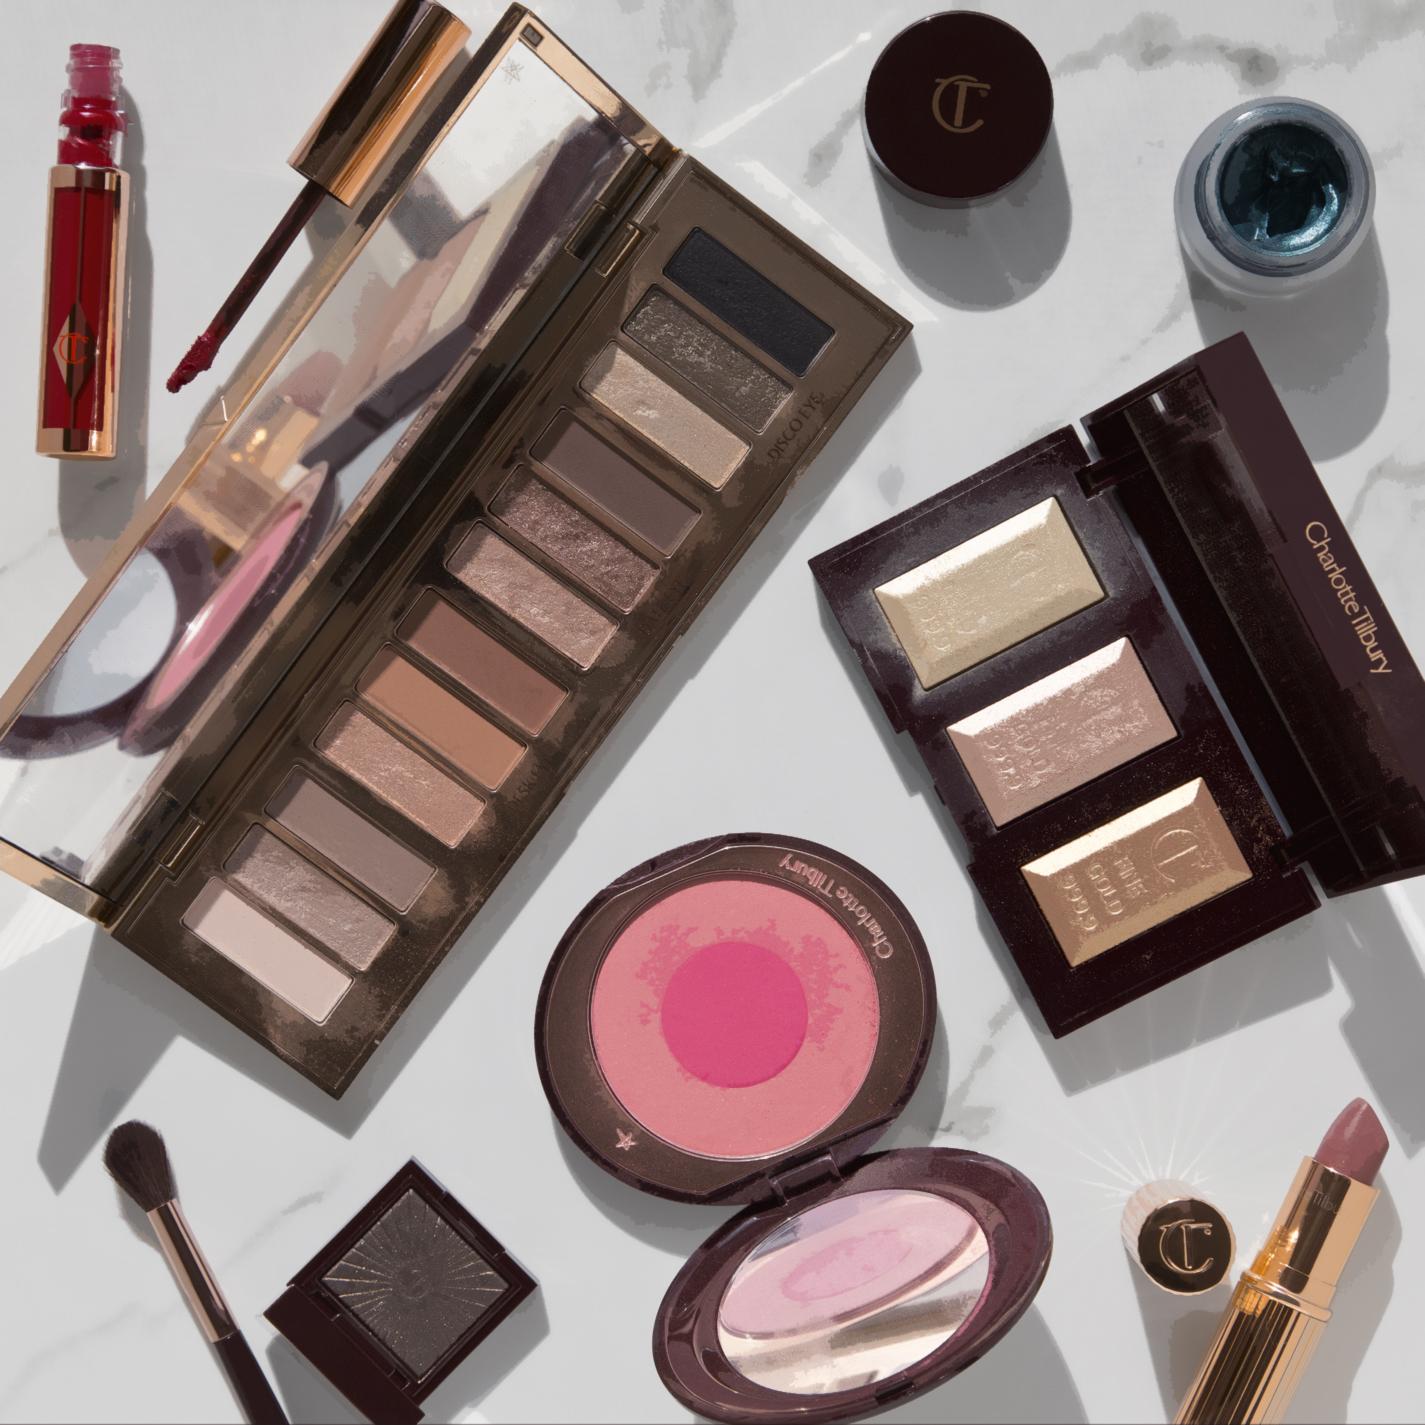 3d57526035d 10 Charlotte Tilbury Makeup Looks — Heather A. Turner